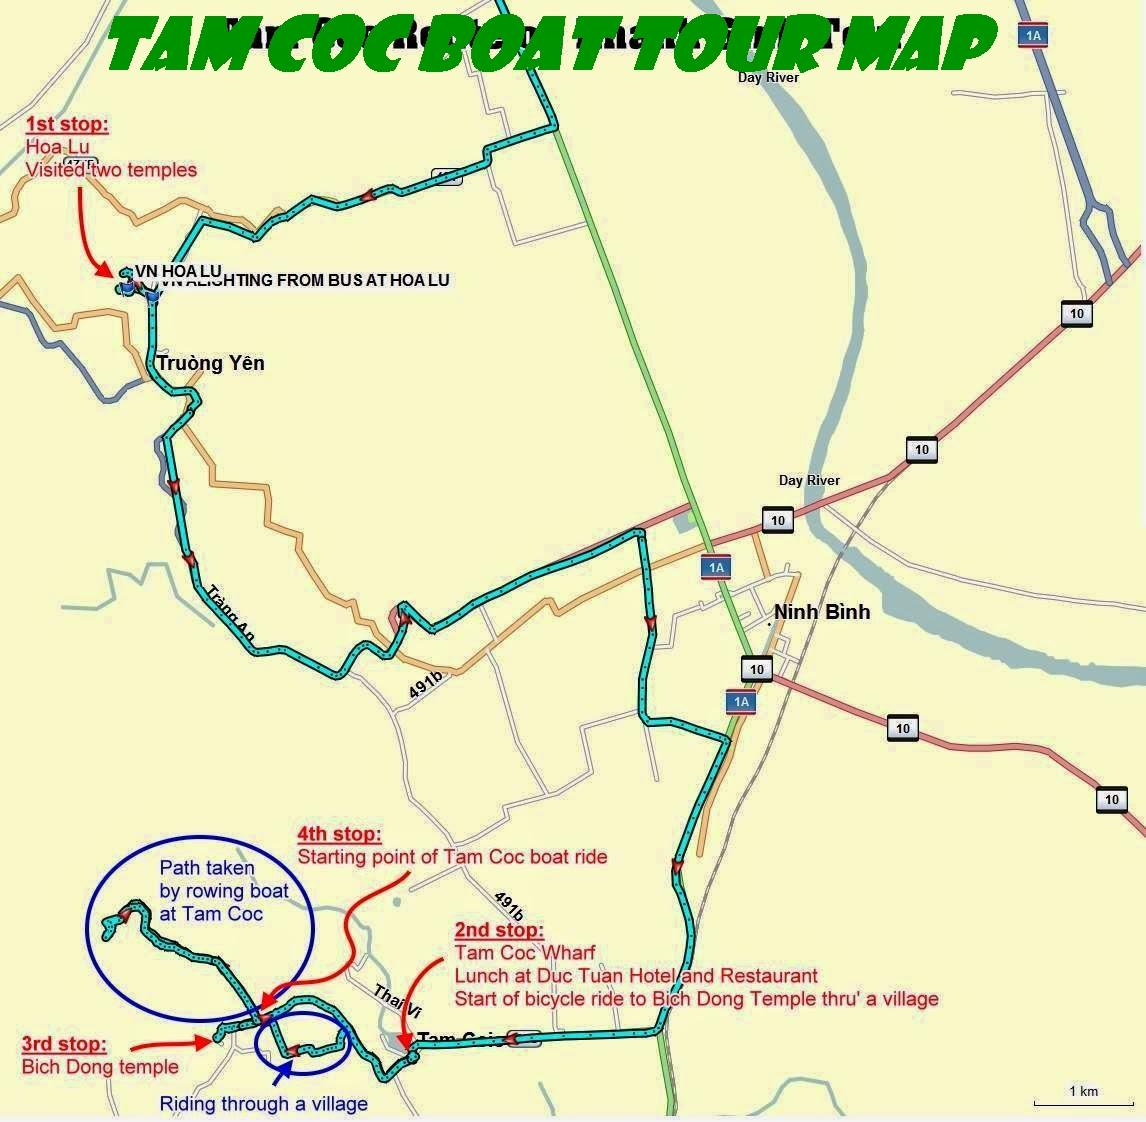 tam-coc-boat-tour-map